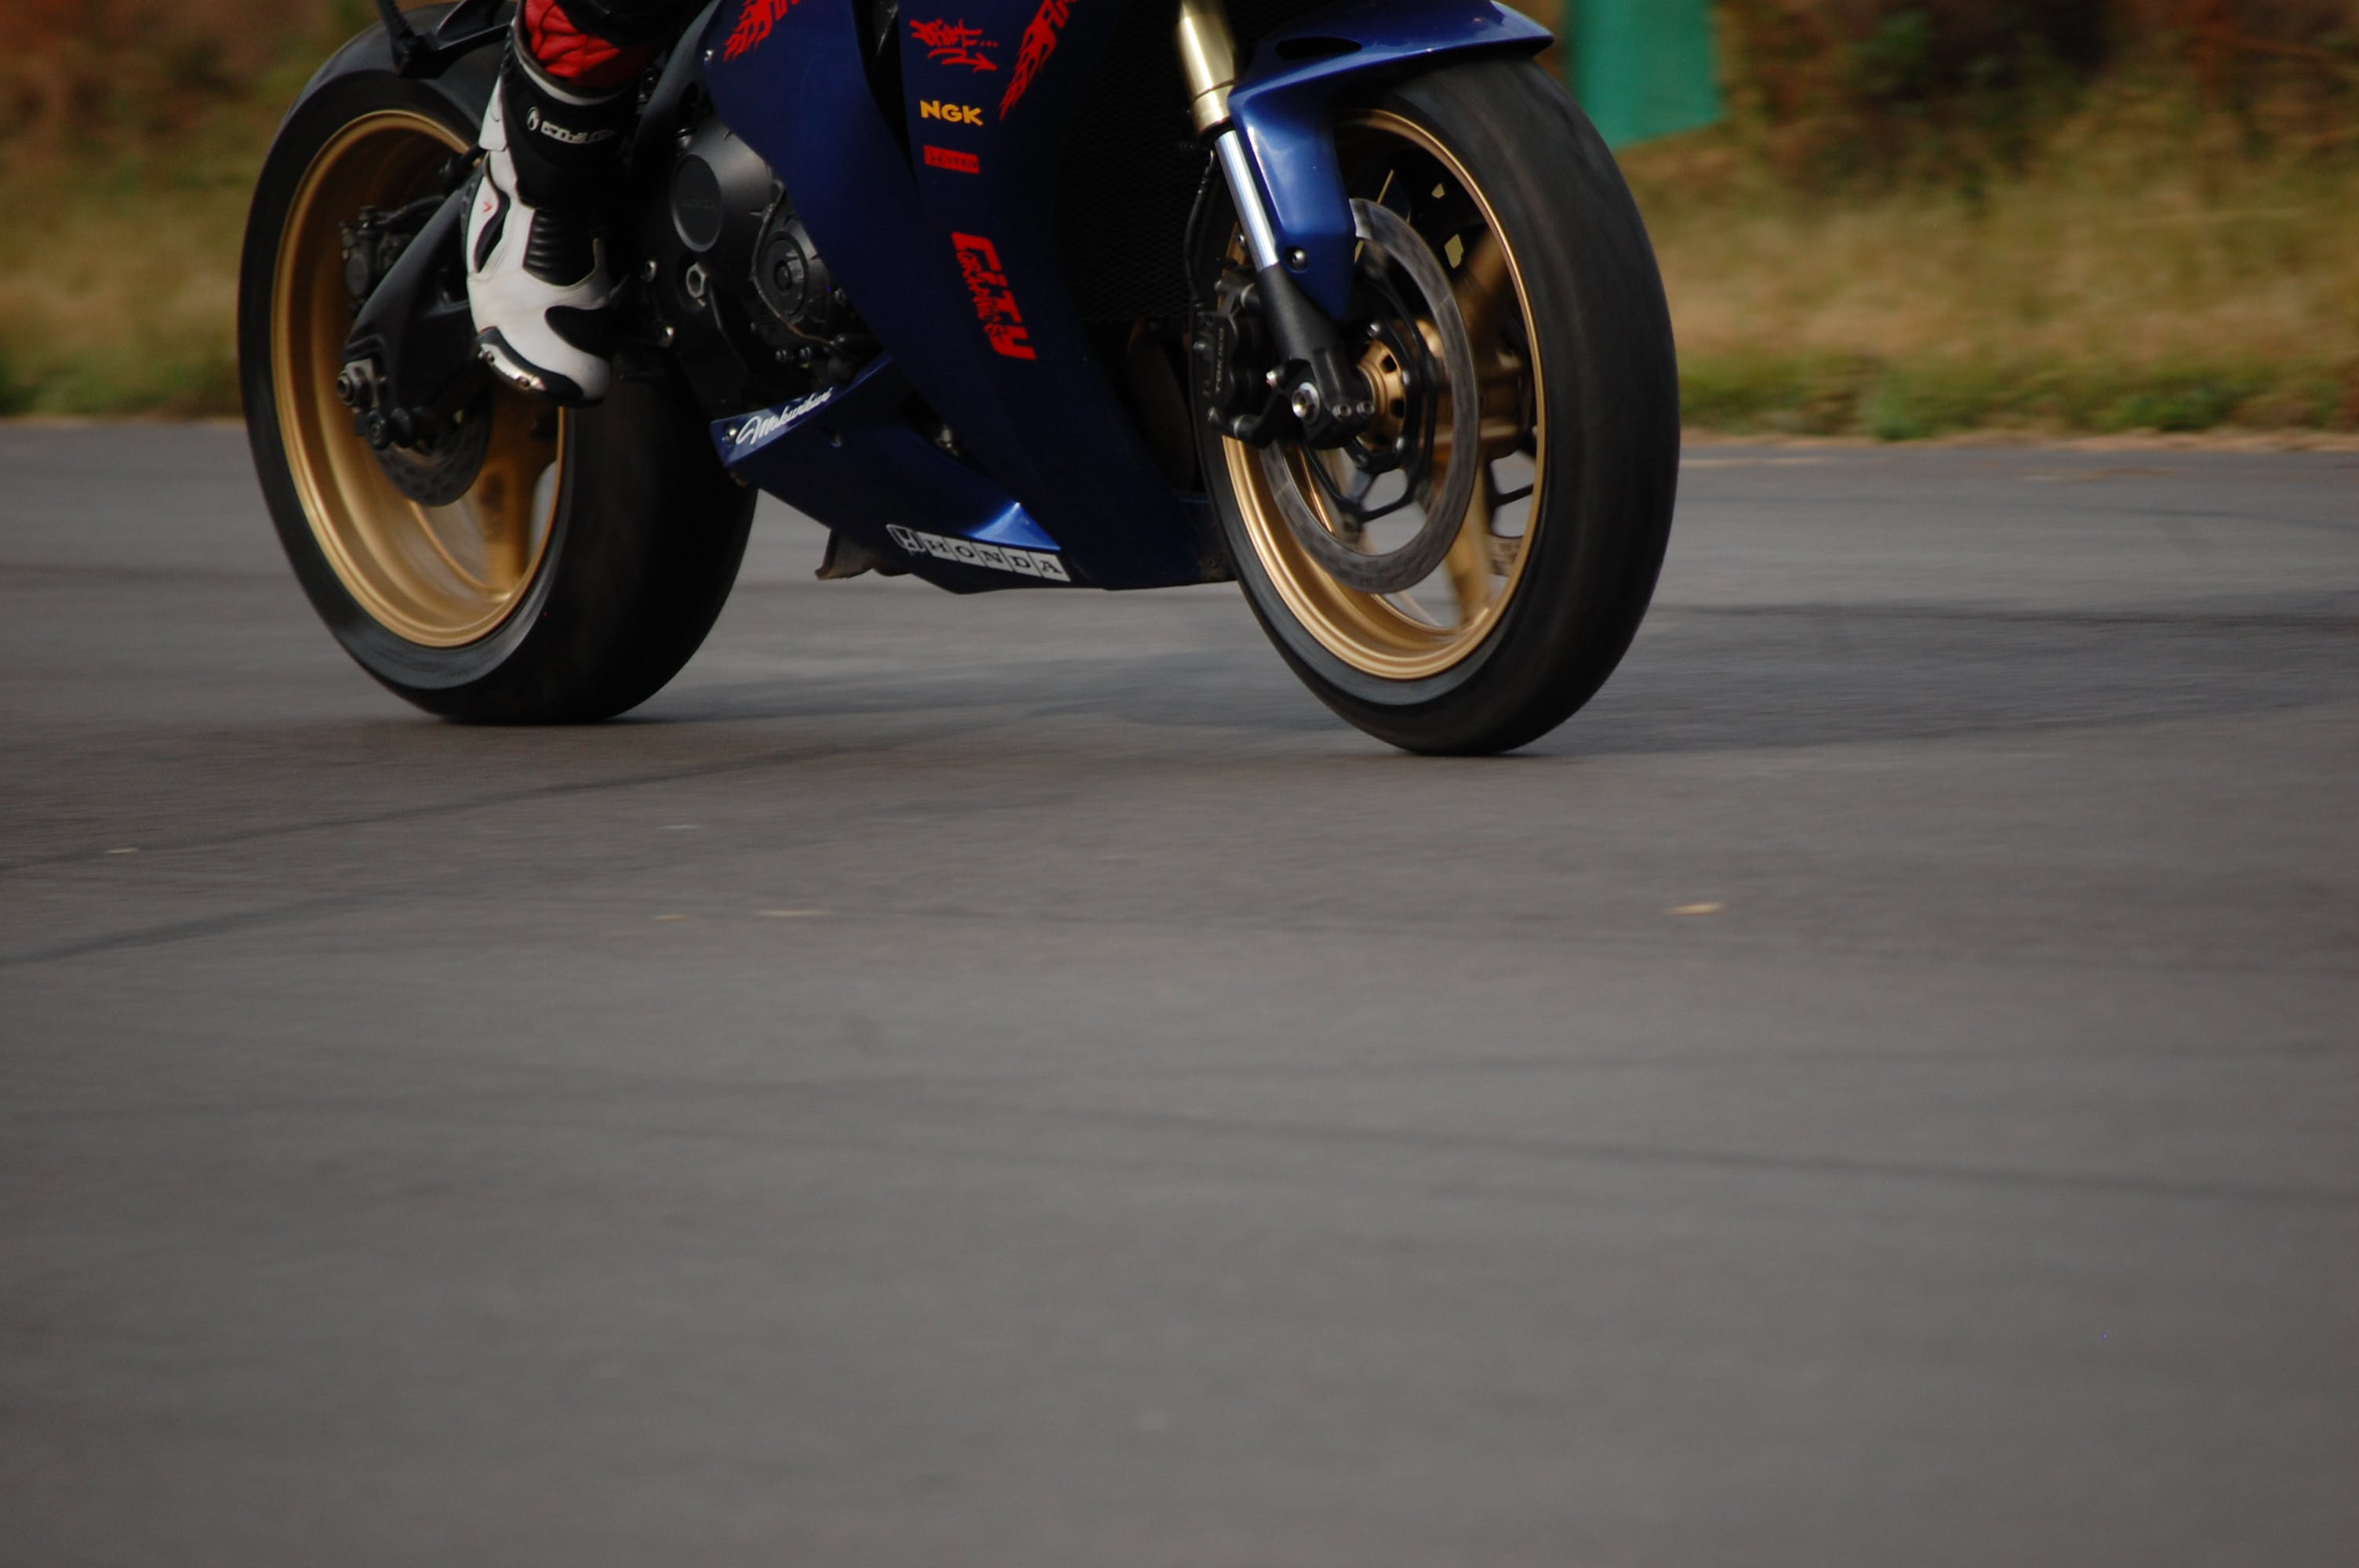 Free stock photo of bike racing